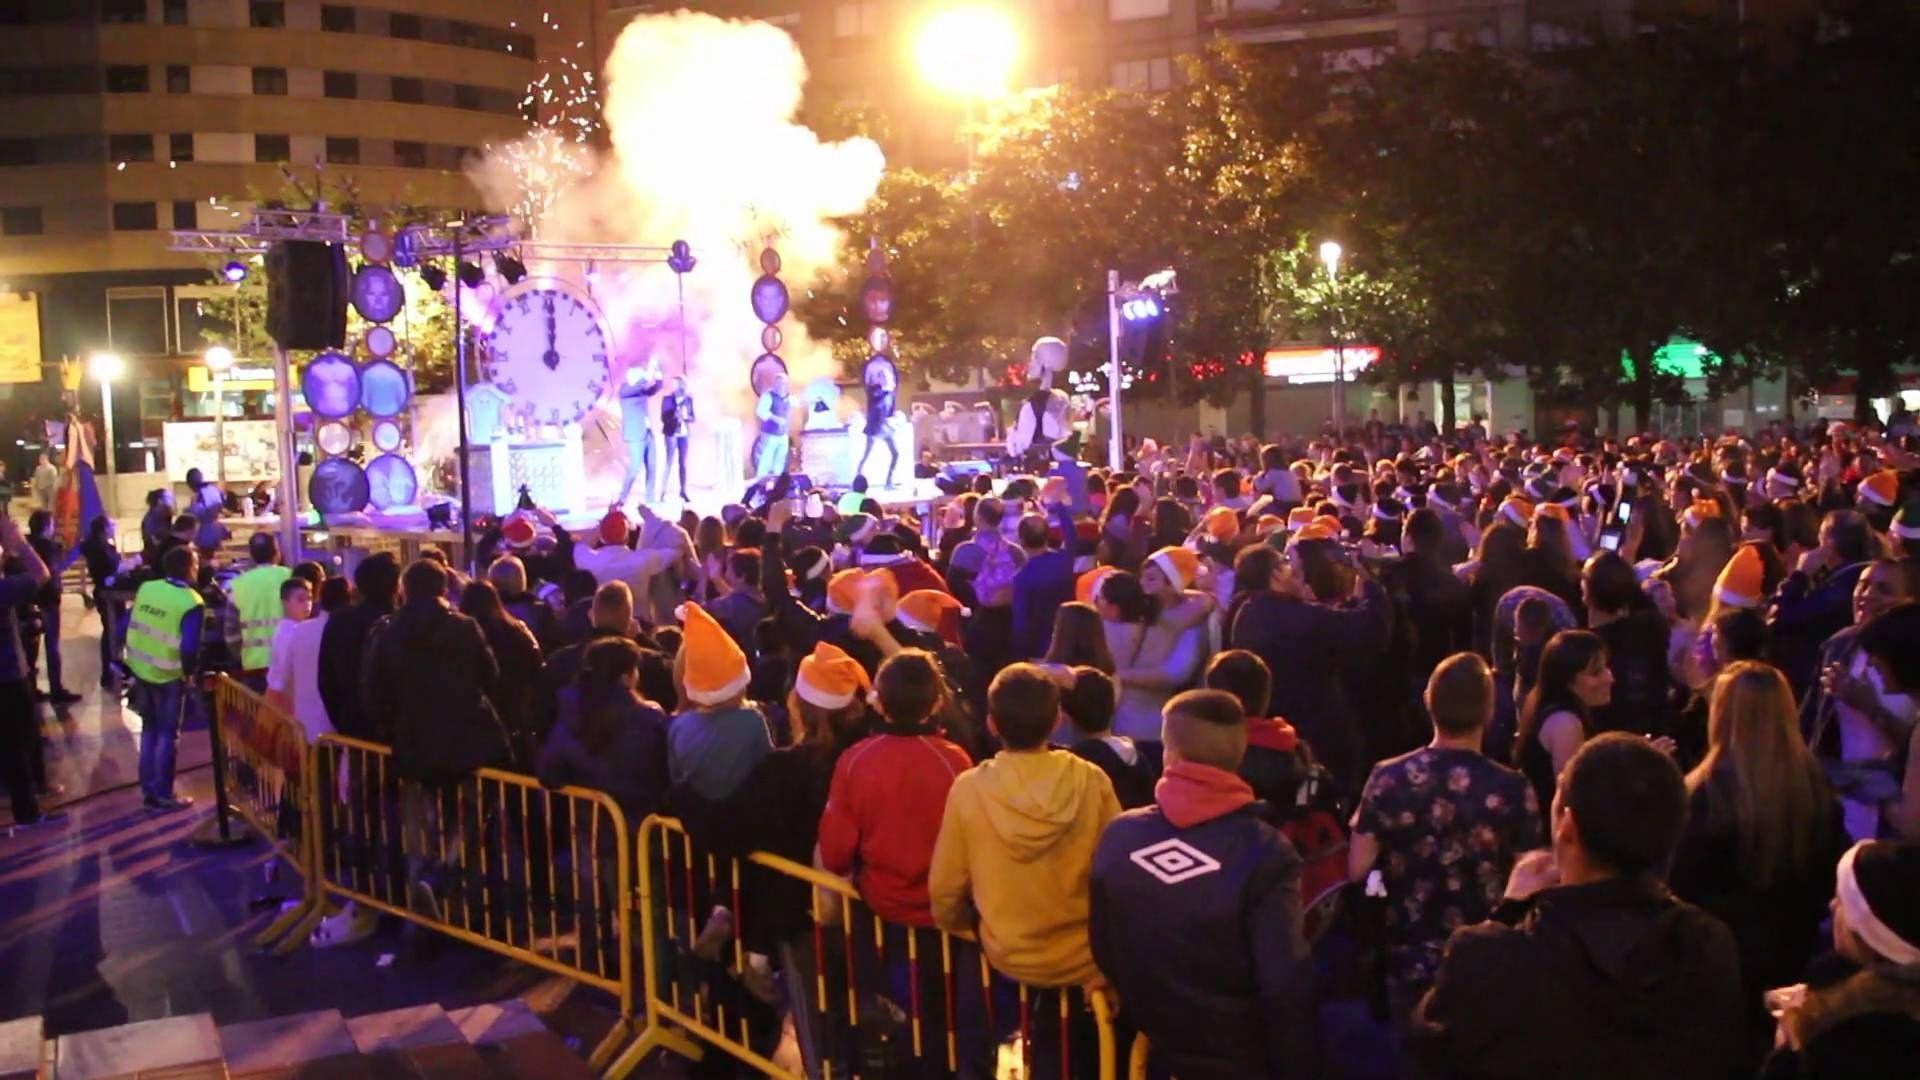 Barakaldo celebra su nochevieja adelanta con miles de personas